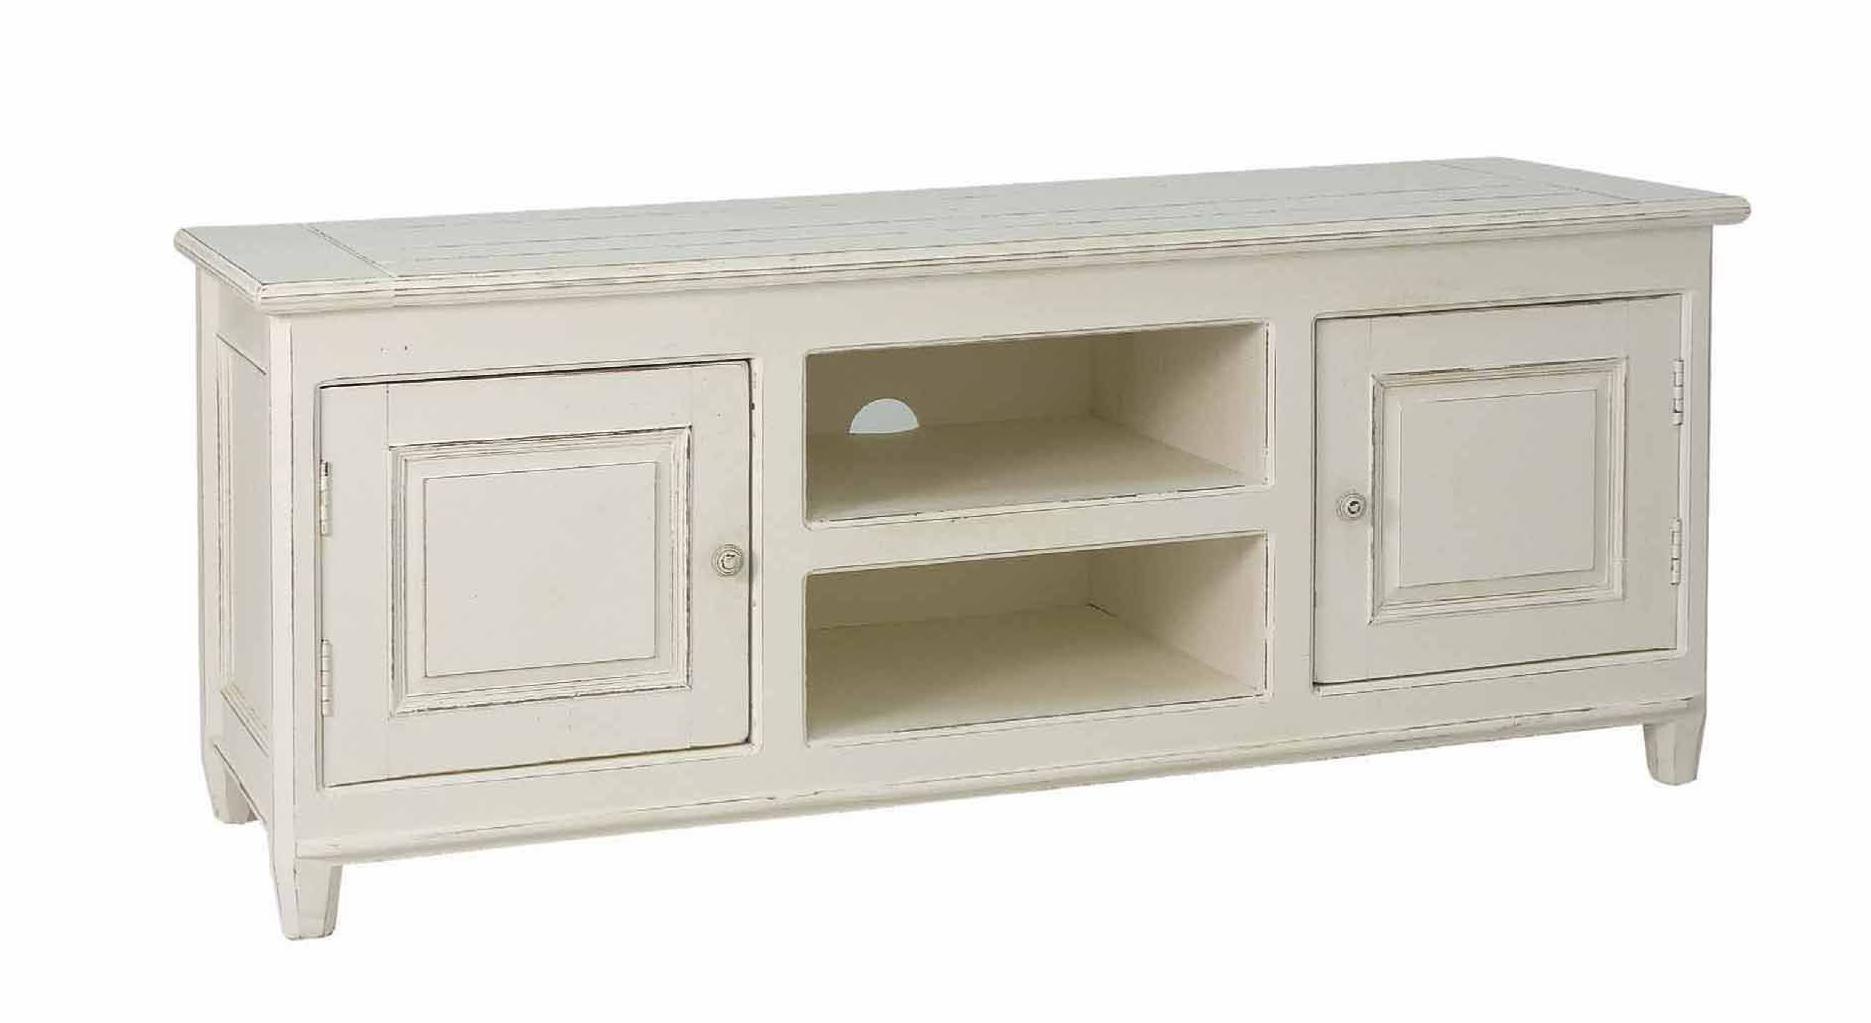 Pintar mueble gris envejecido 20170804091059 for Muebles de madera color gris